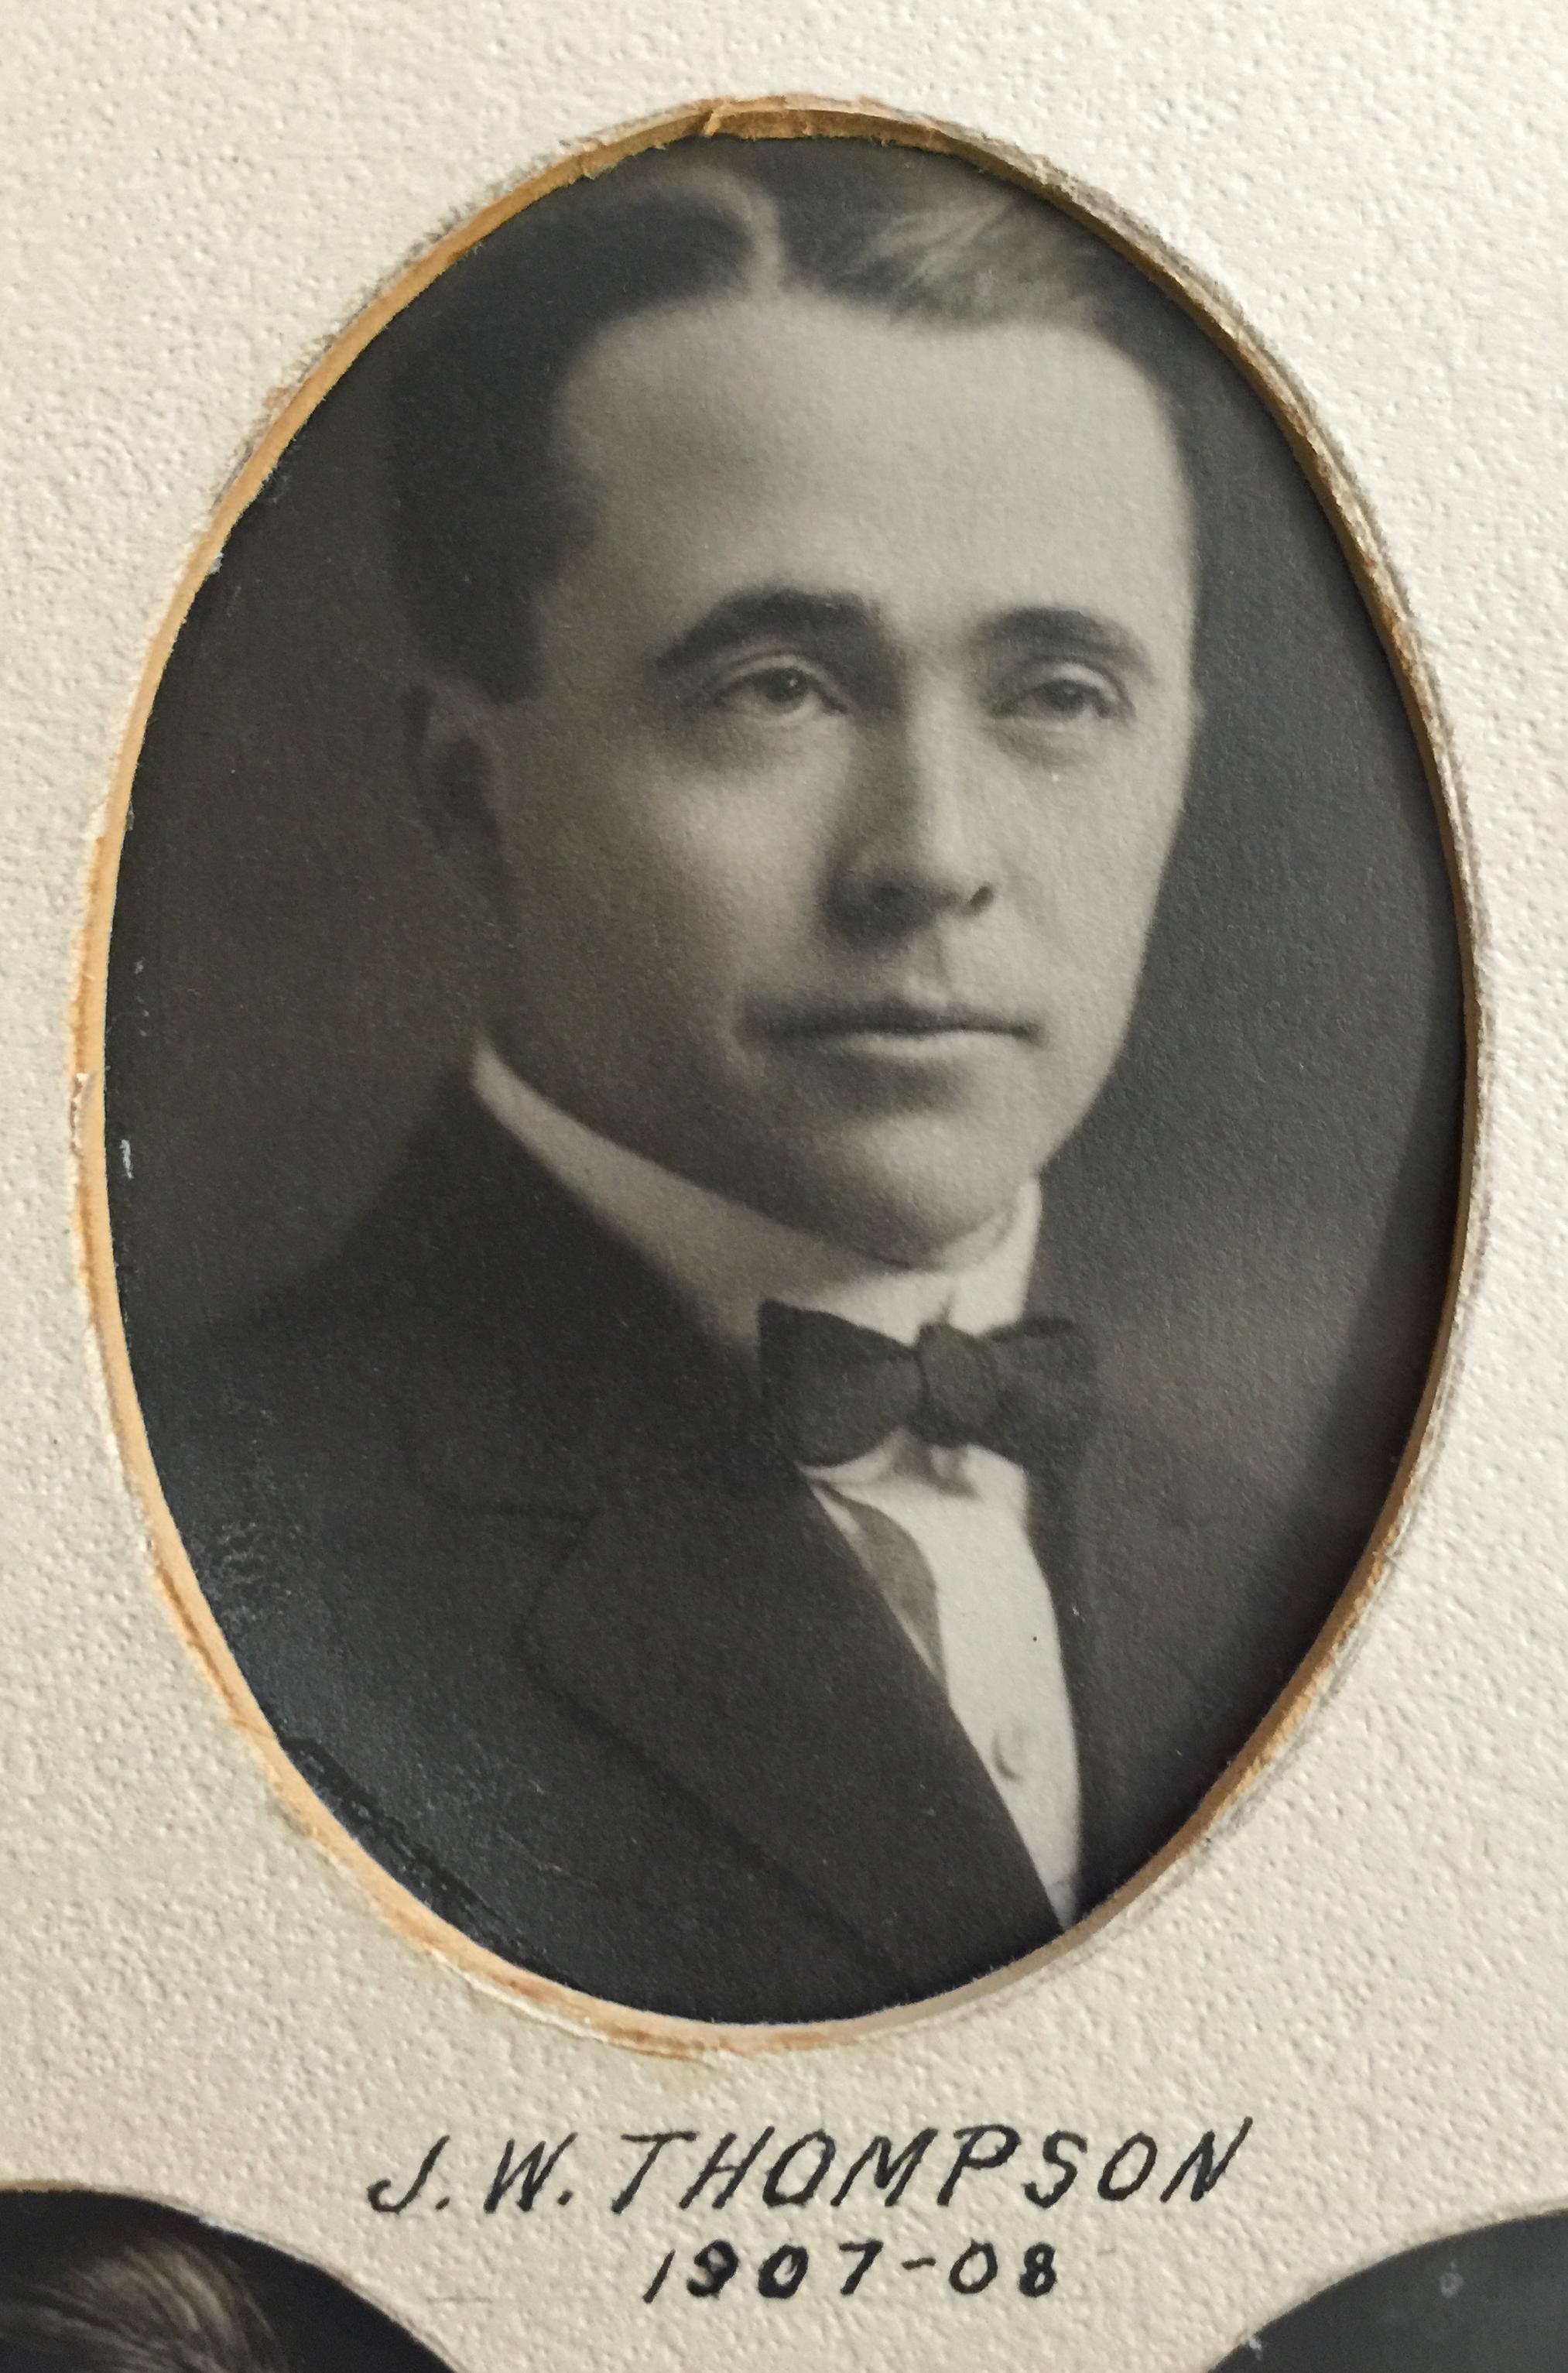 1907-1908 J.W. Thompson